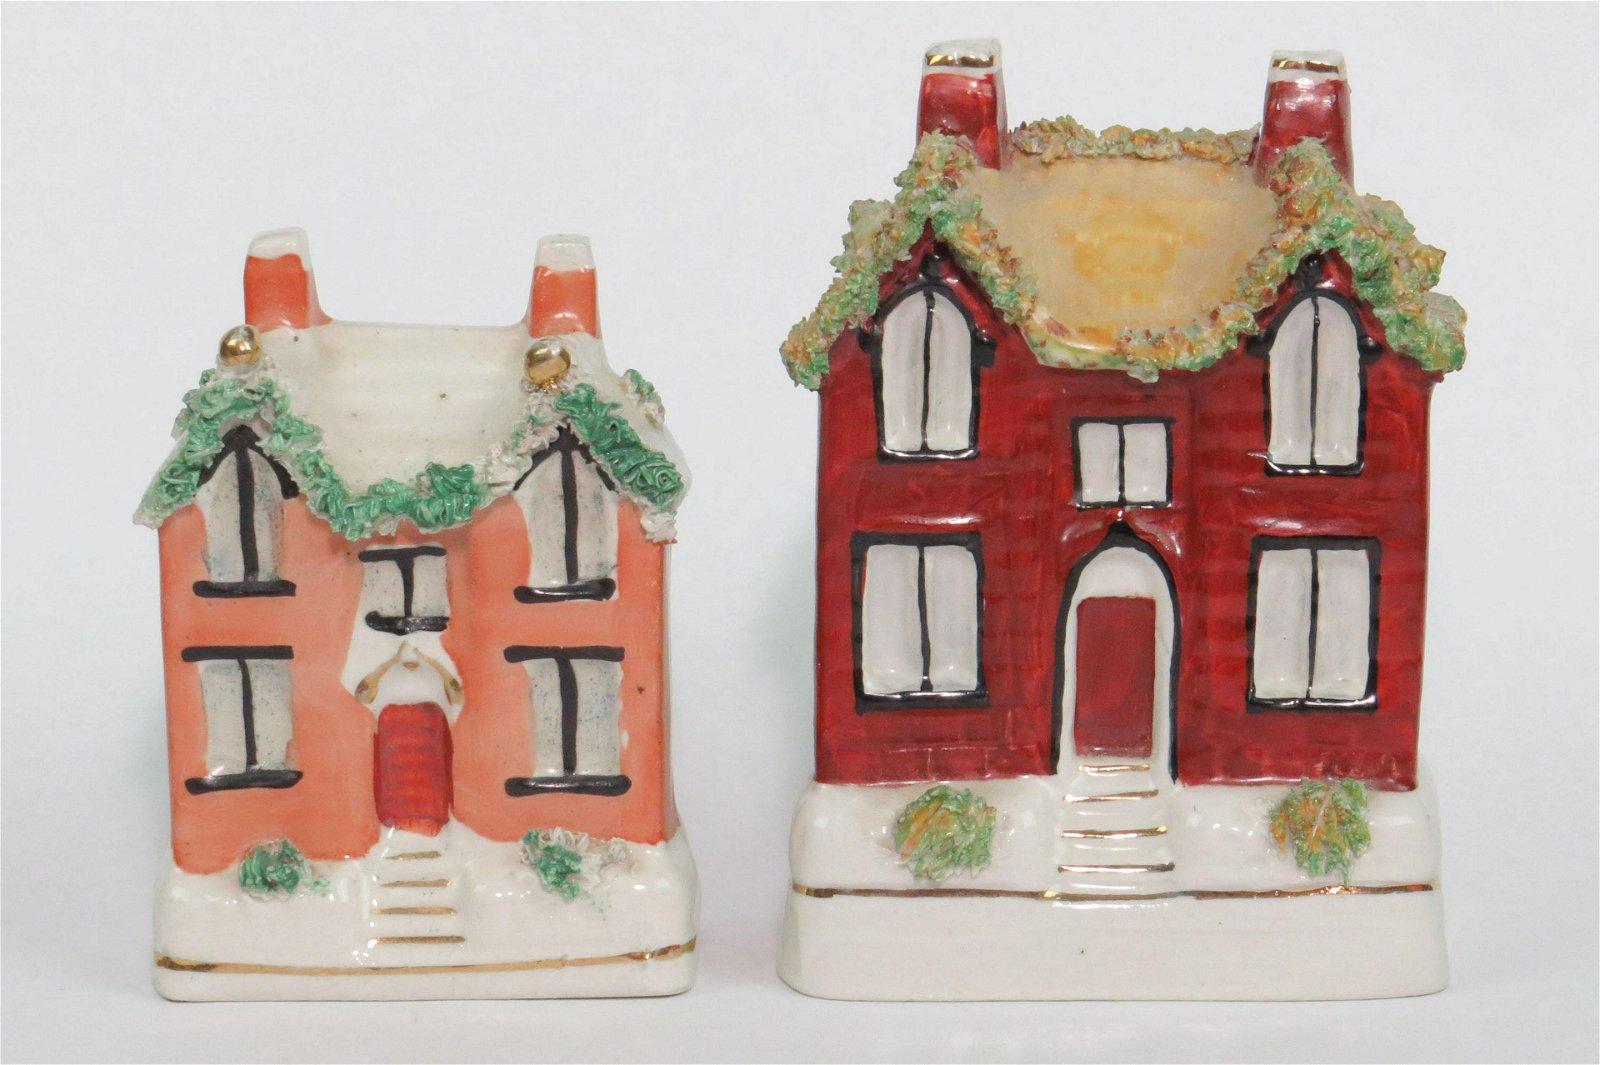 Lot of 2 Ceramic Staffordshire Building Banks